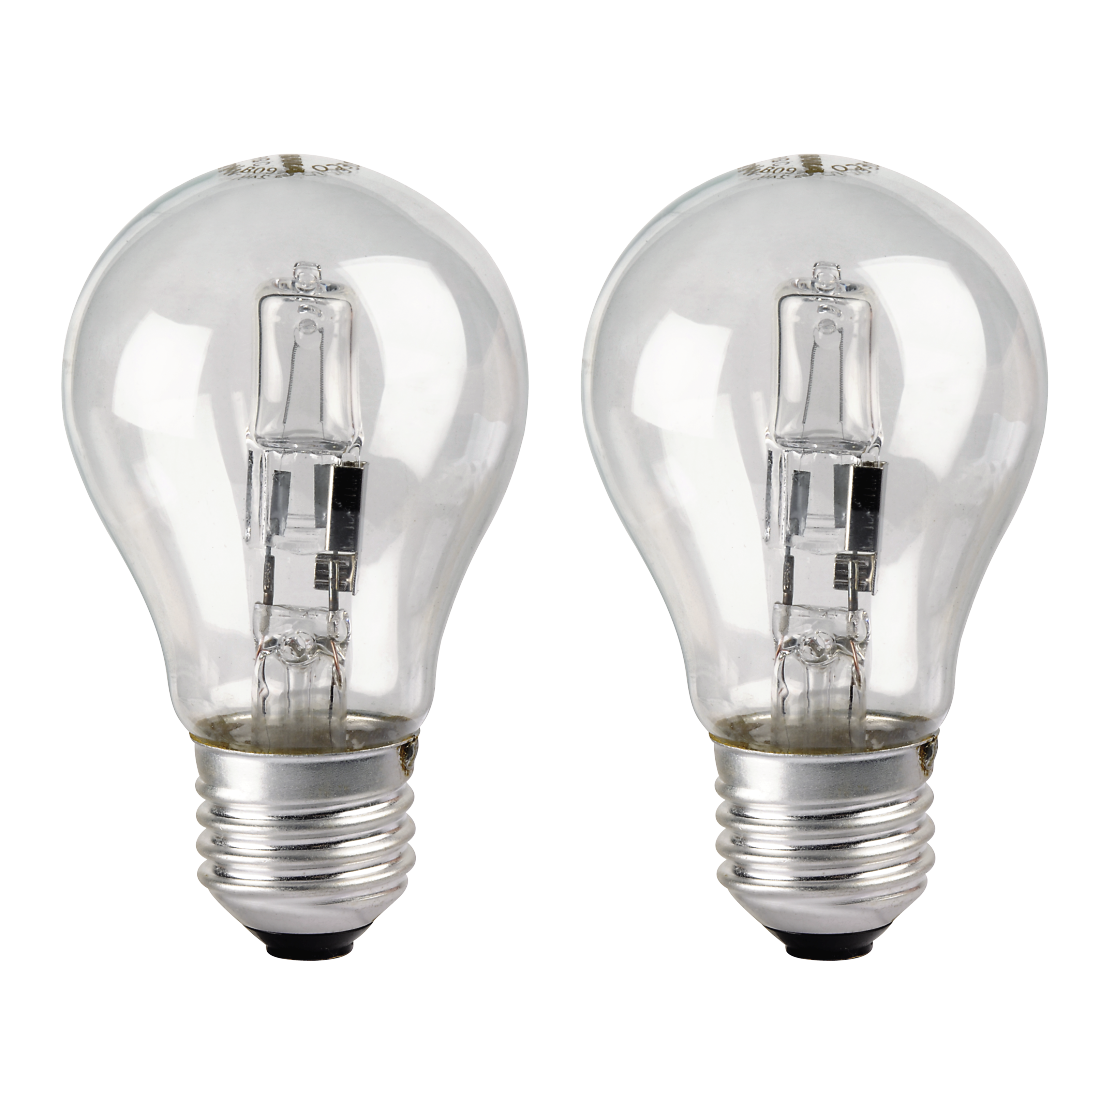 00112451 xavax ampoule incandescence halog ne e27 30w blanc chaud 2 pi ces. Black Bedroom Furniture Sets. Home Design Ideas